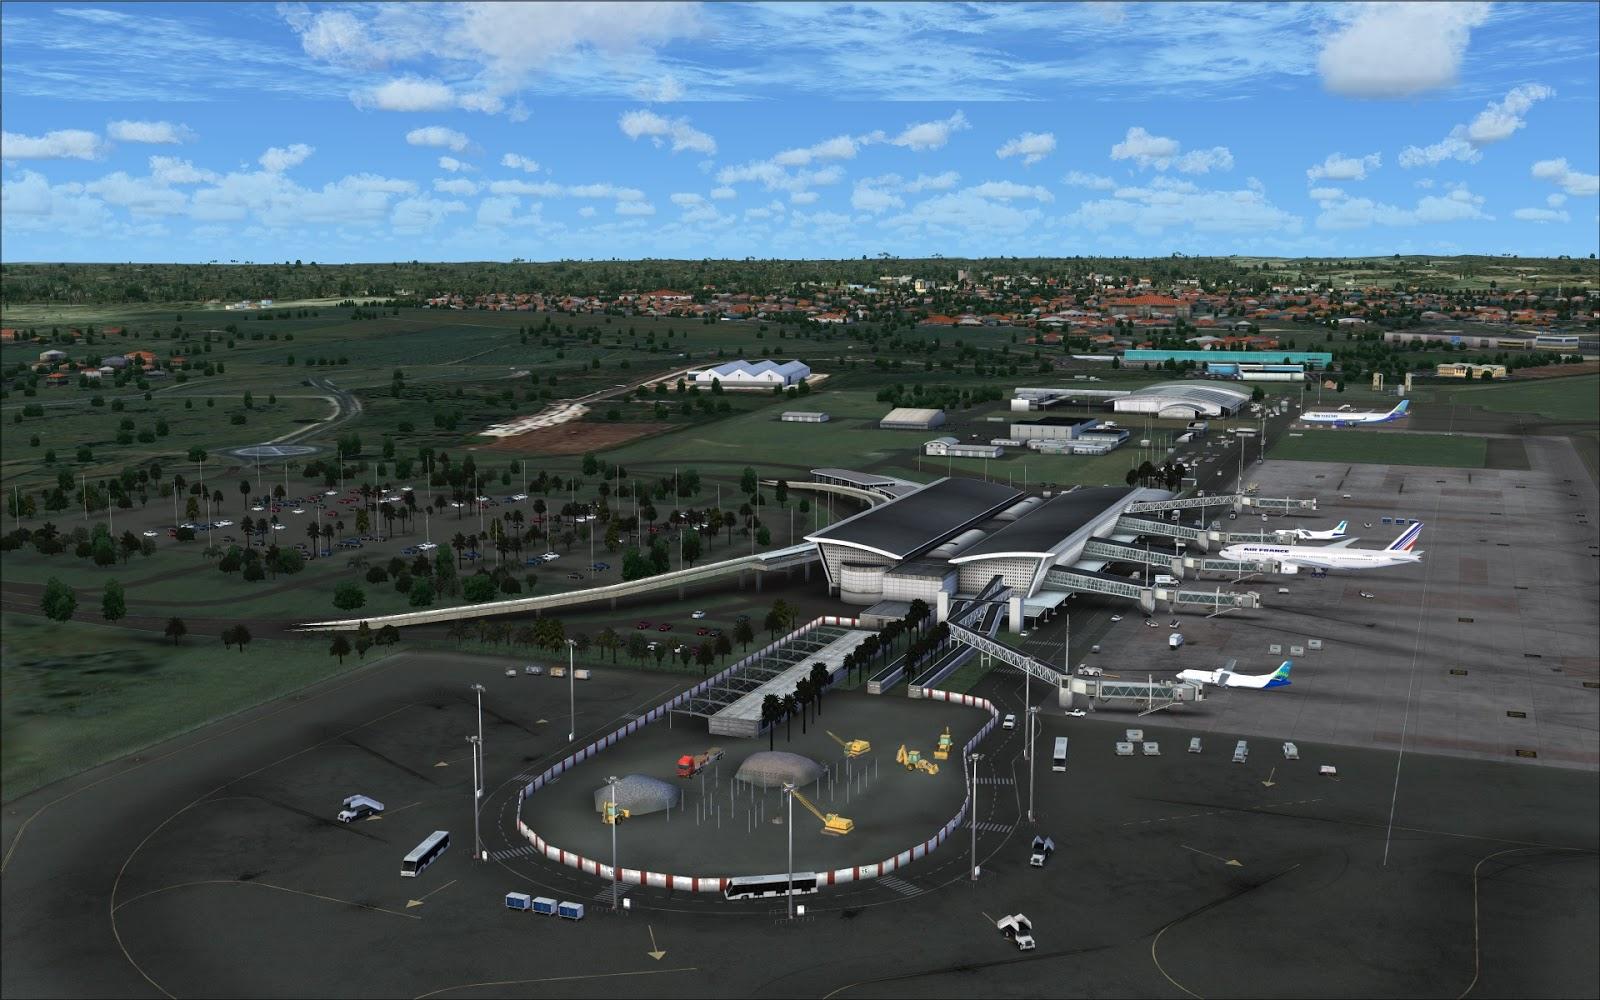 FSX/P3Dv3/P3Dv4] - TAXI2GATE - POINTE-À-PITRE LE RAIZET AIRPORT TFFR